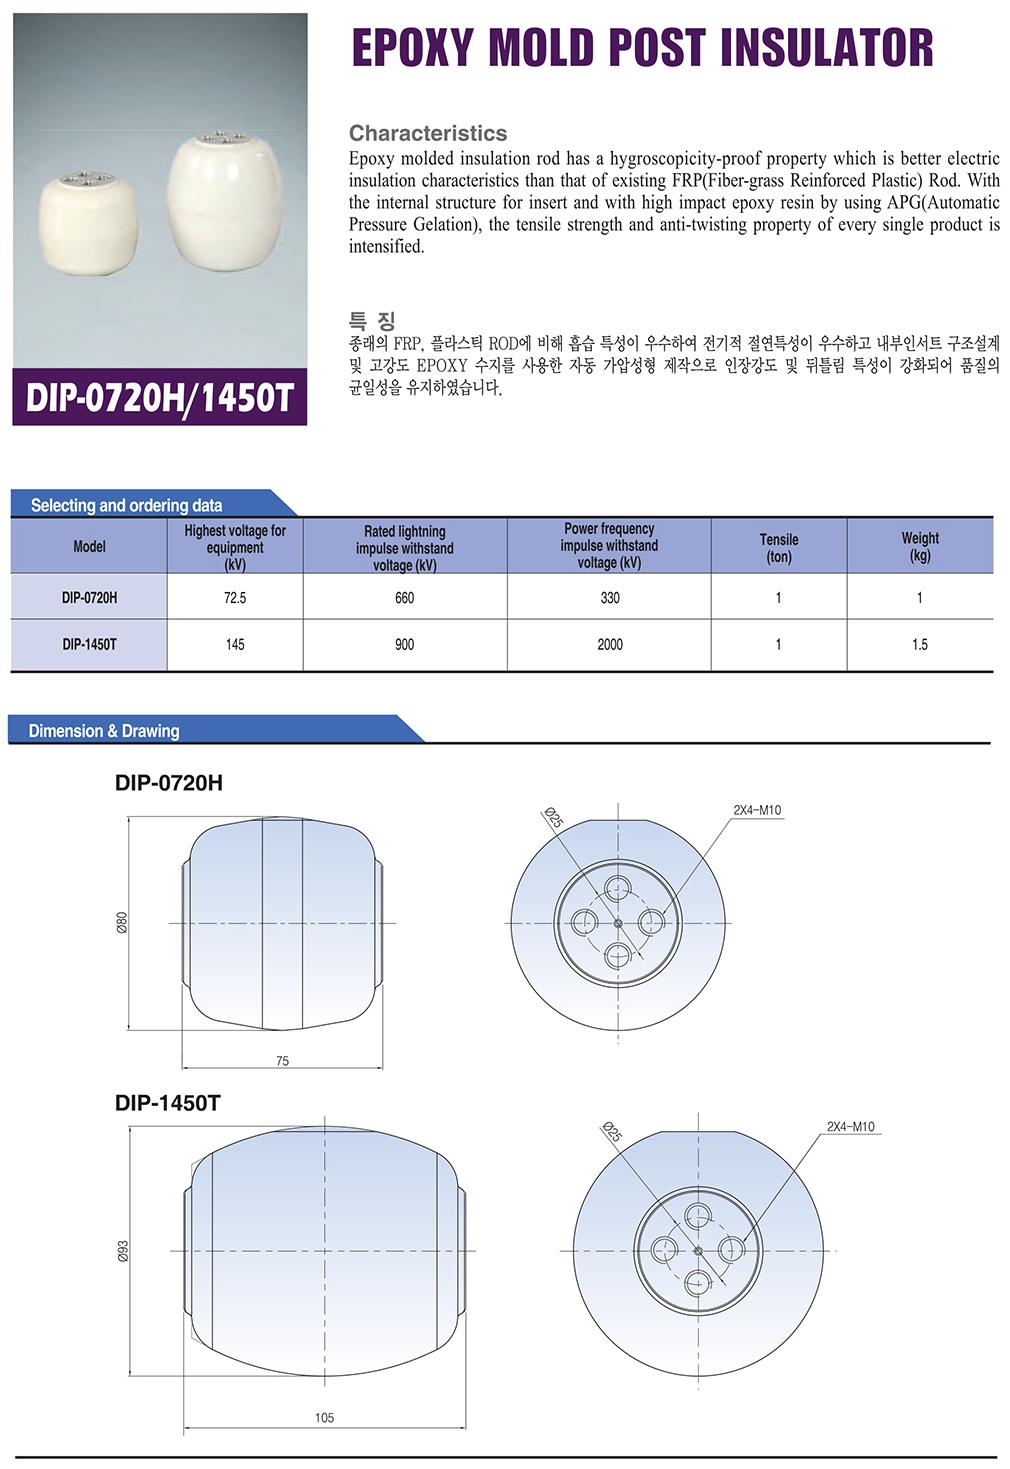 DONGWOO Epoxy Mold Post Insulator DIP-0720H/1450T